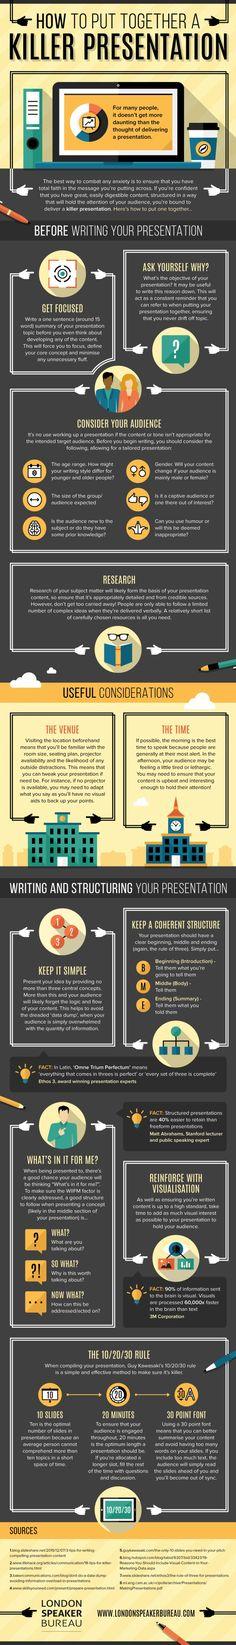 steps to killer presentation